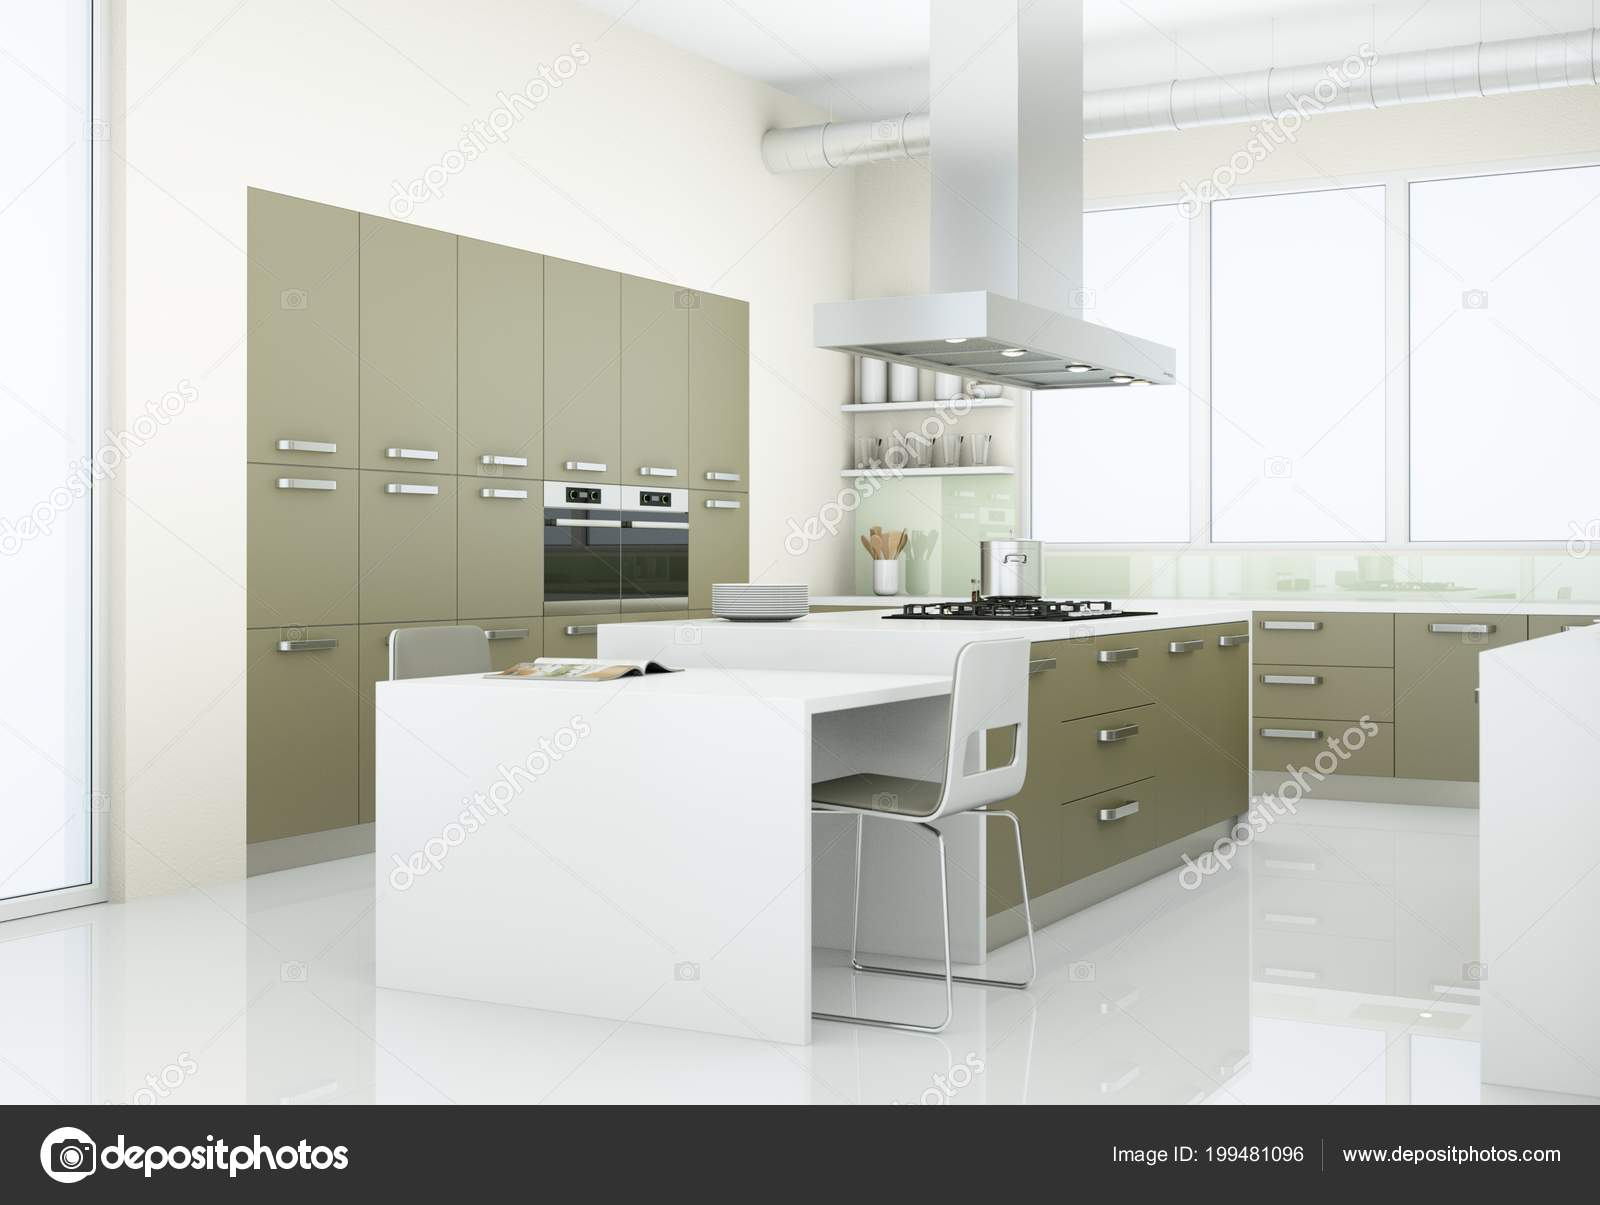 Grijze moderne keuken in hok met grote ramen u2014 stockfoto © virtua73